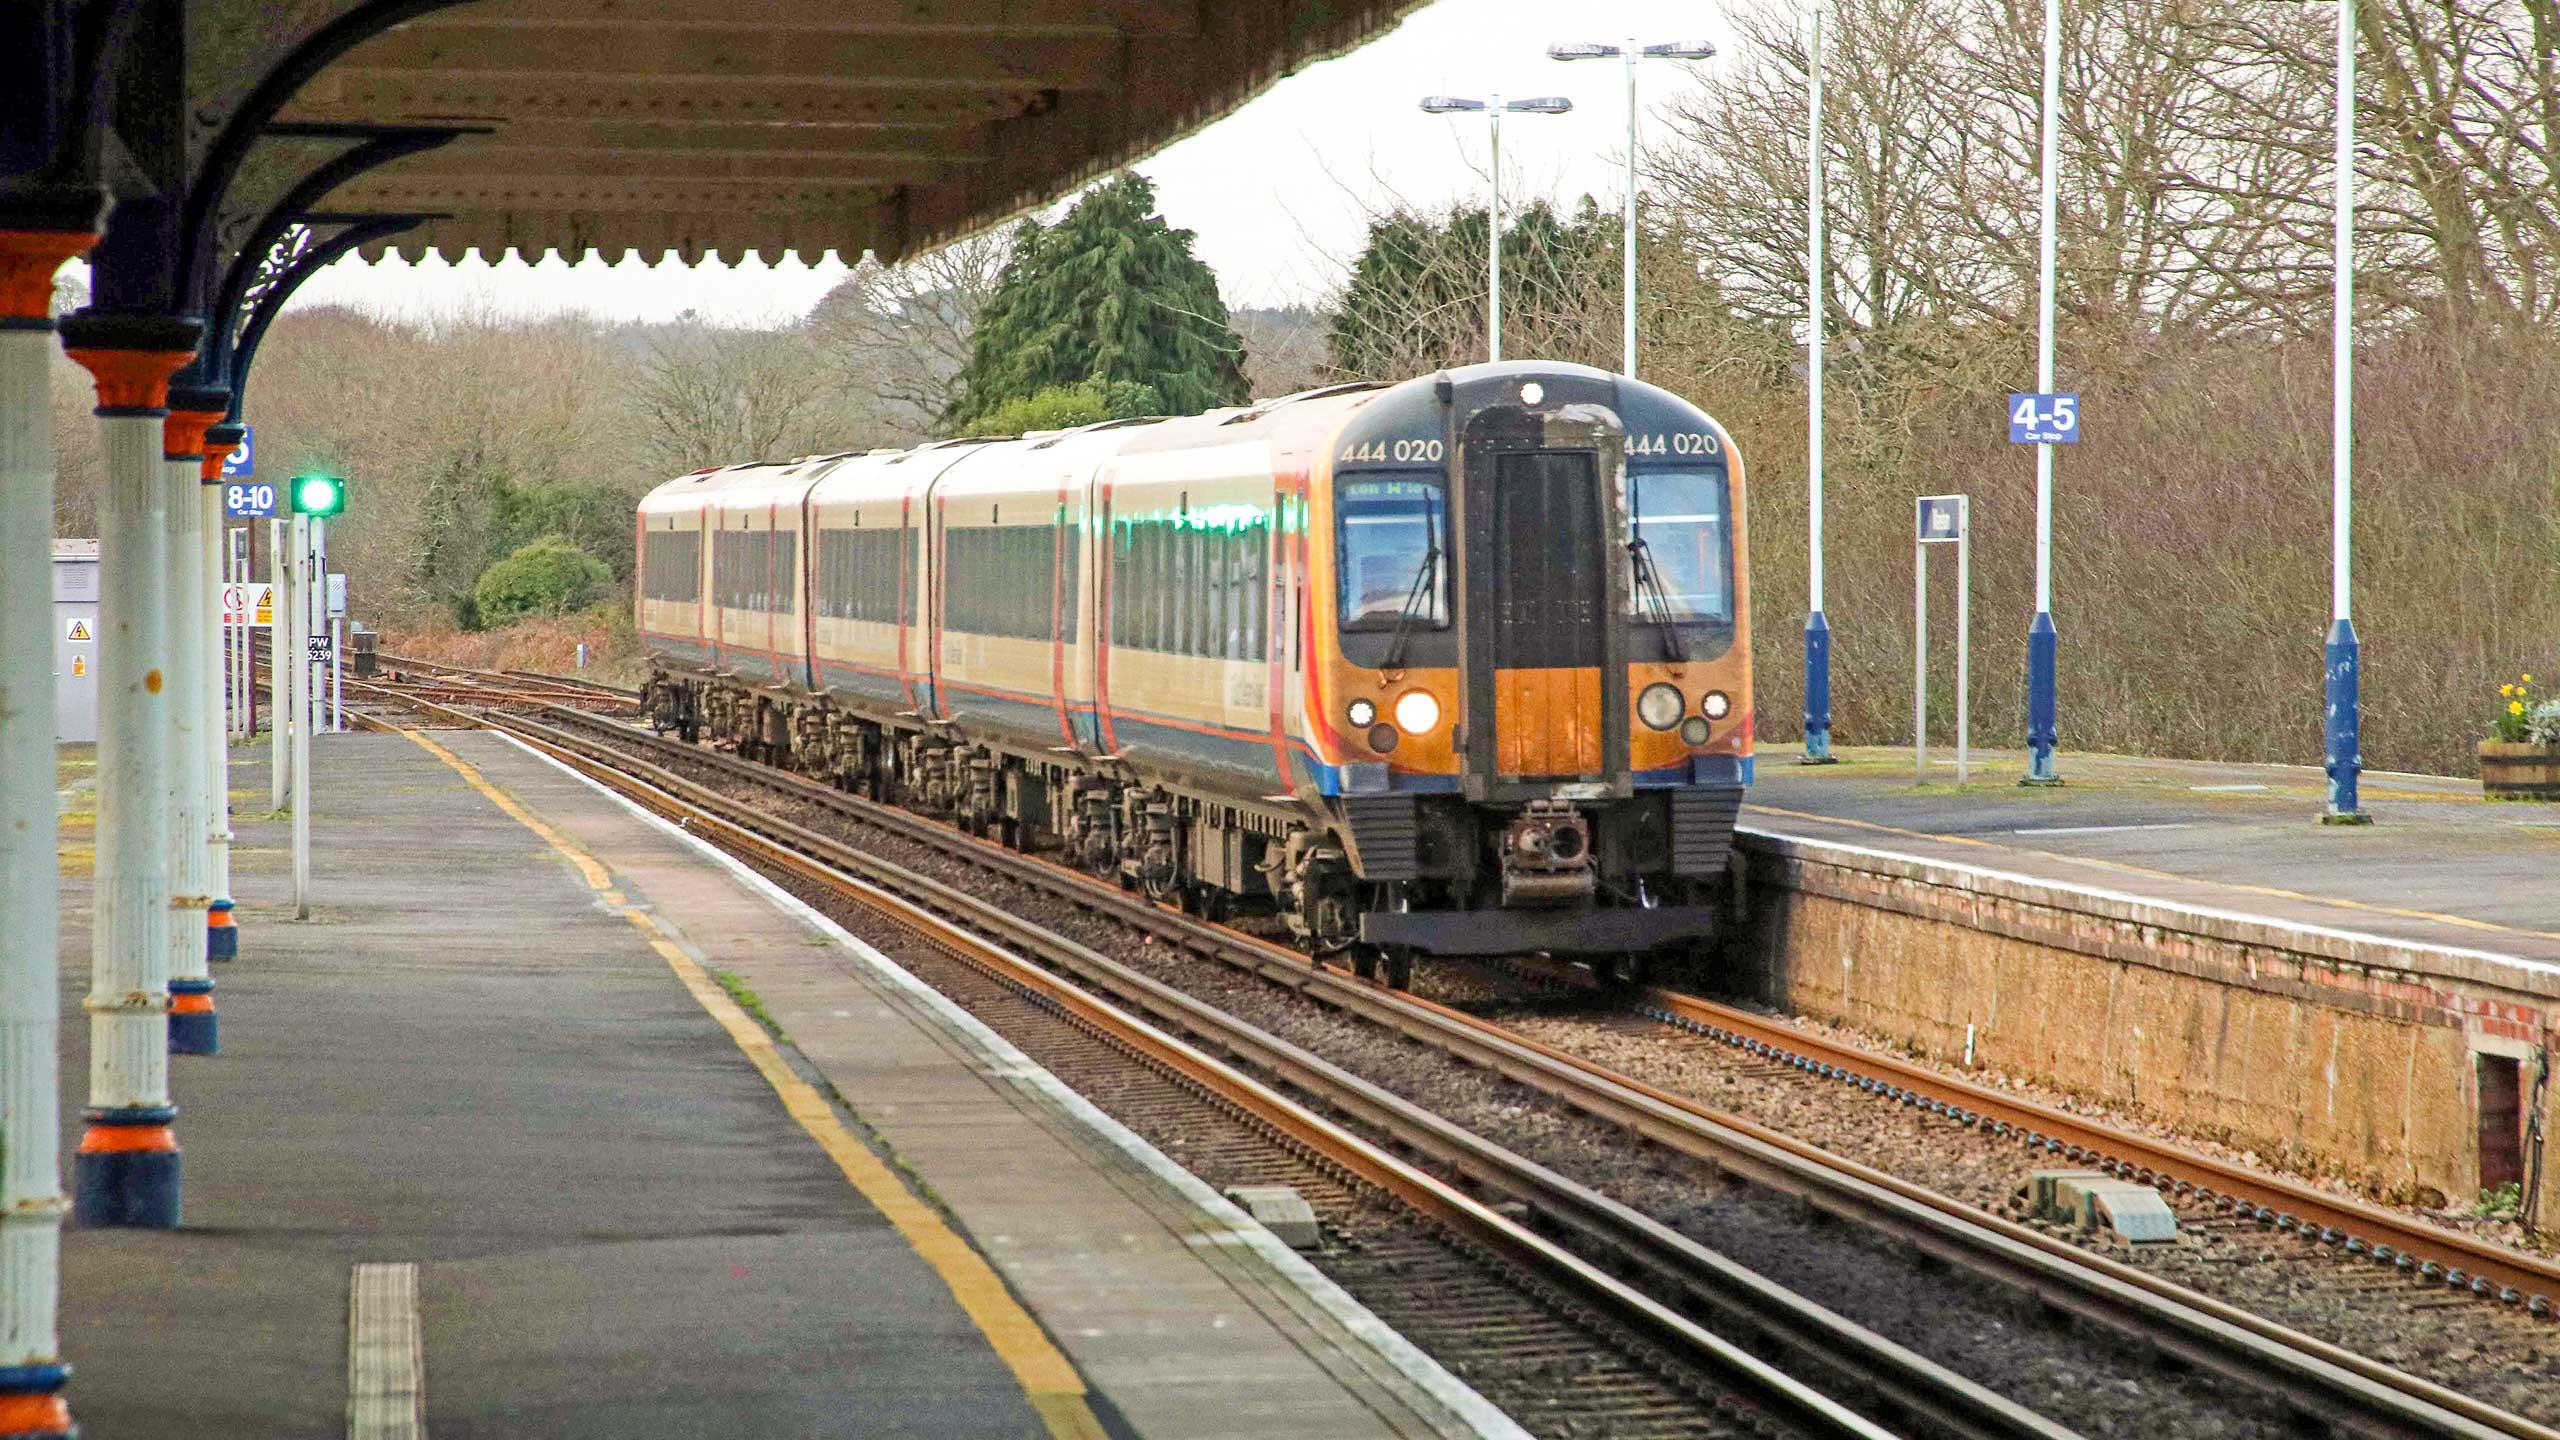 Purbeck Community Rail Partnership Wareham Train Station 005 2560x1440px